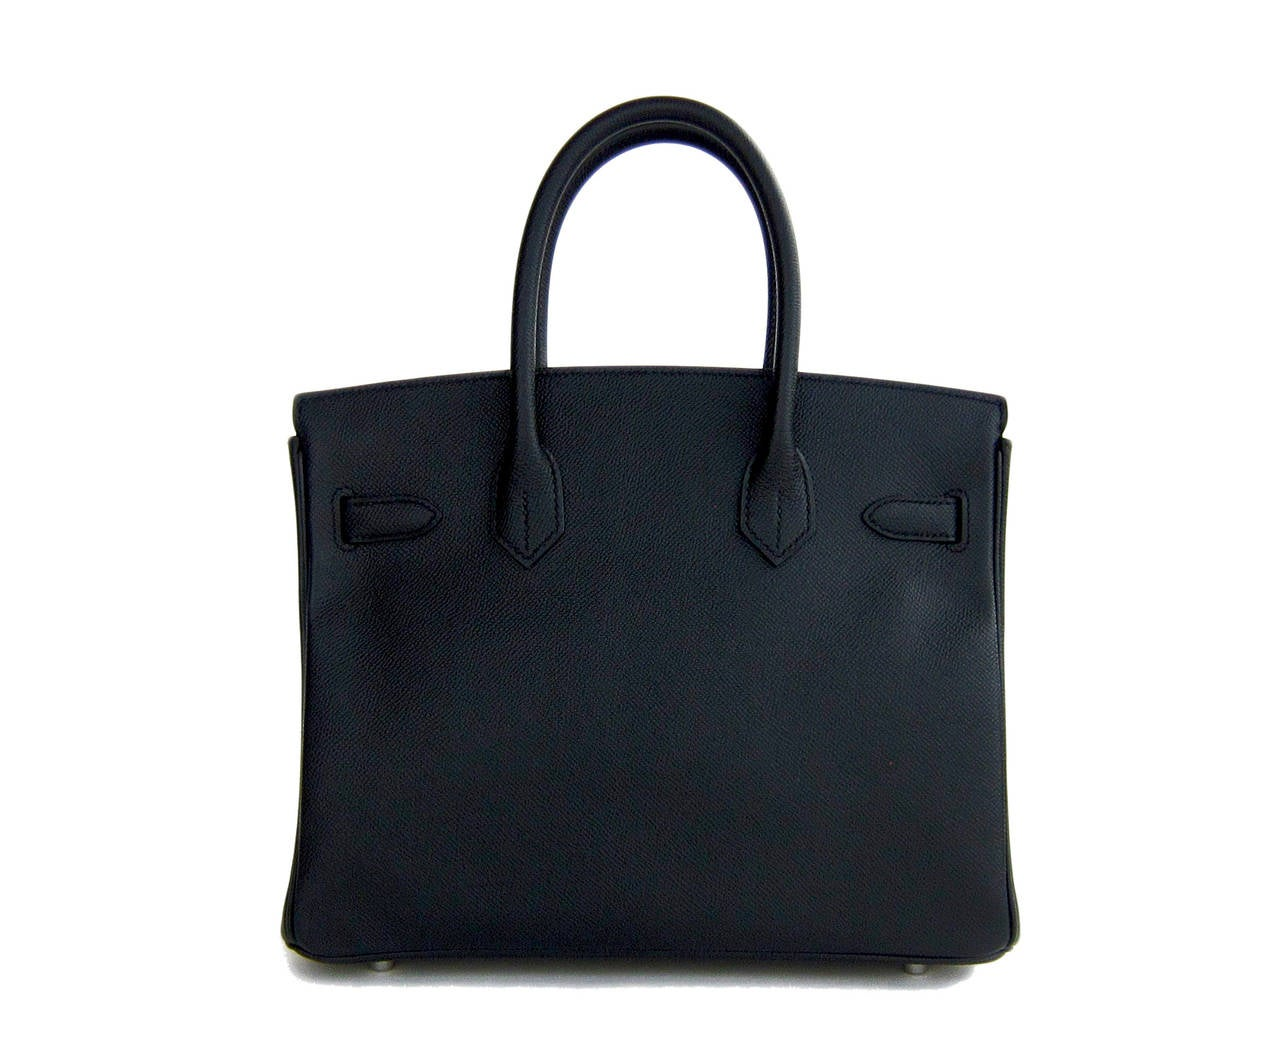 Hermes Black Epsom 30cm Birkin Palladium Hardware Architectural In New never worn Condition For Sale In New York, NY